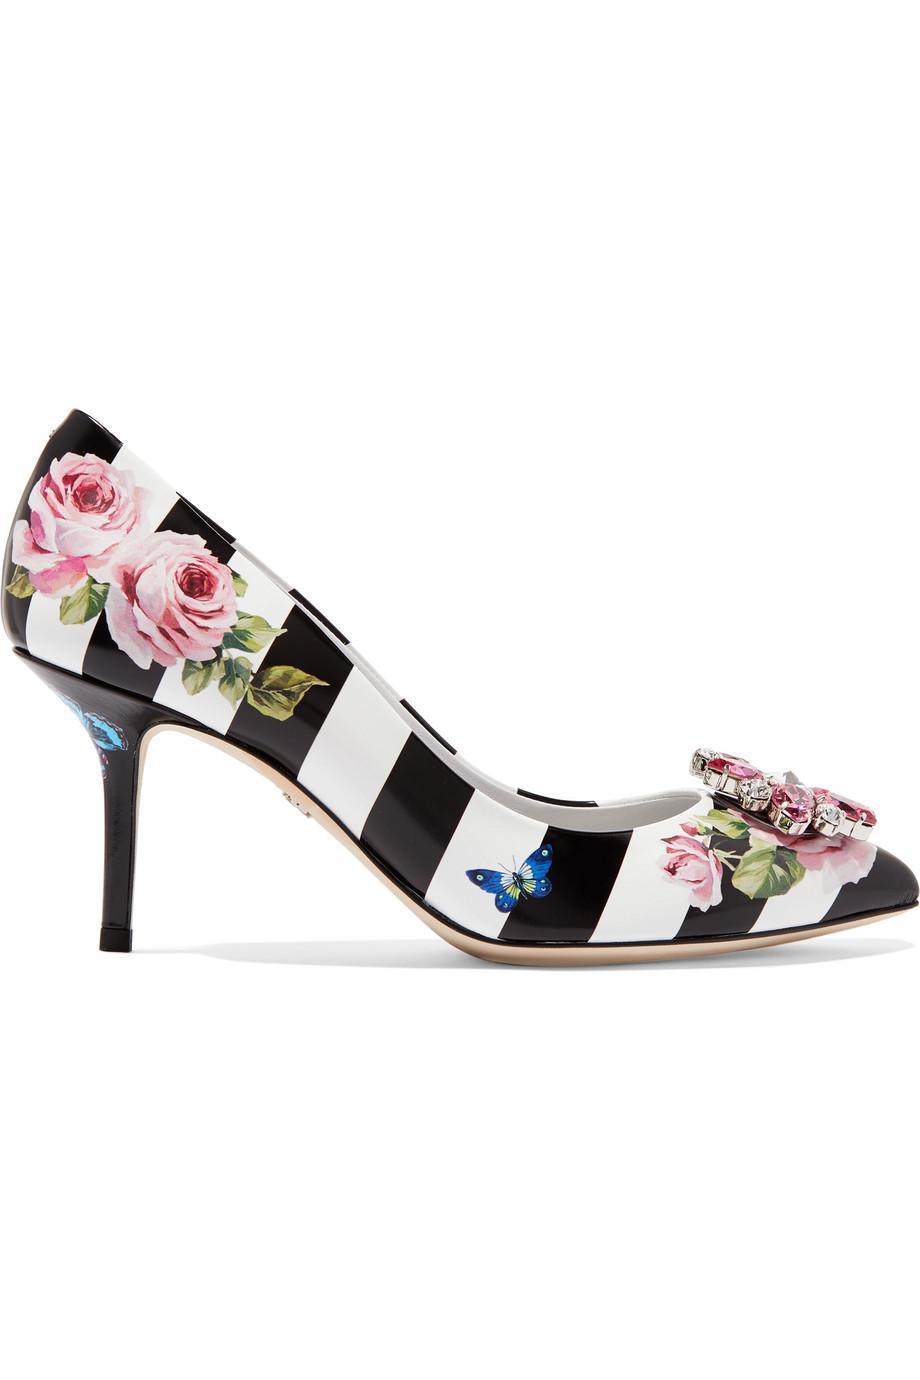 Crystal-embellished Printed Patent-leather Pumps - Black Dolce & Gabbana yXS0oT